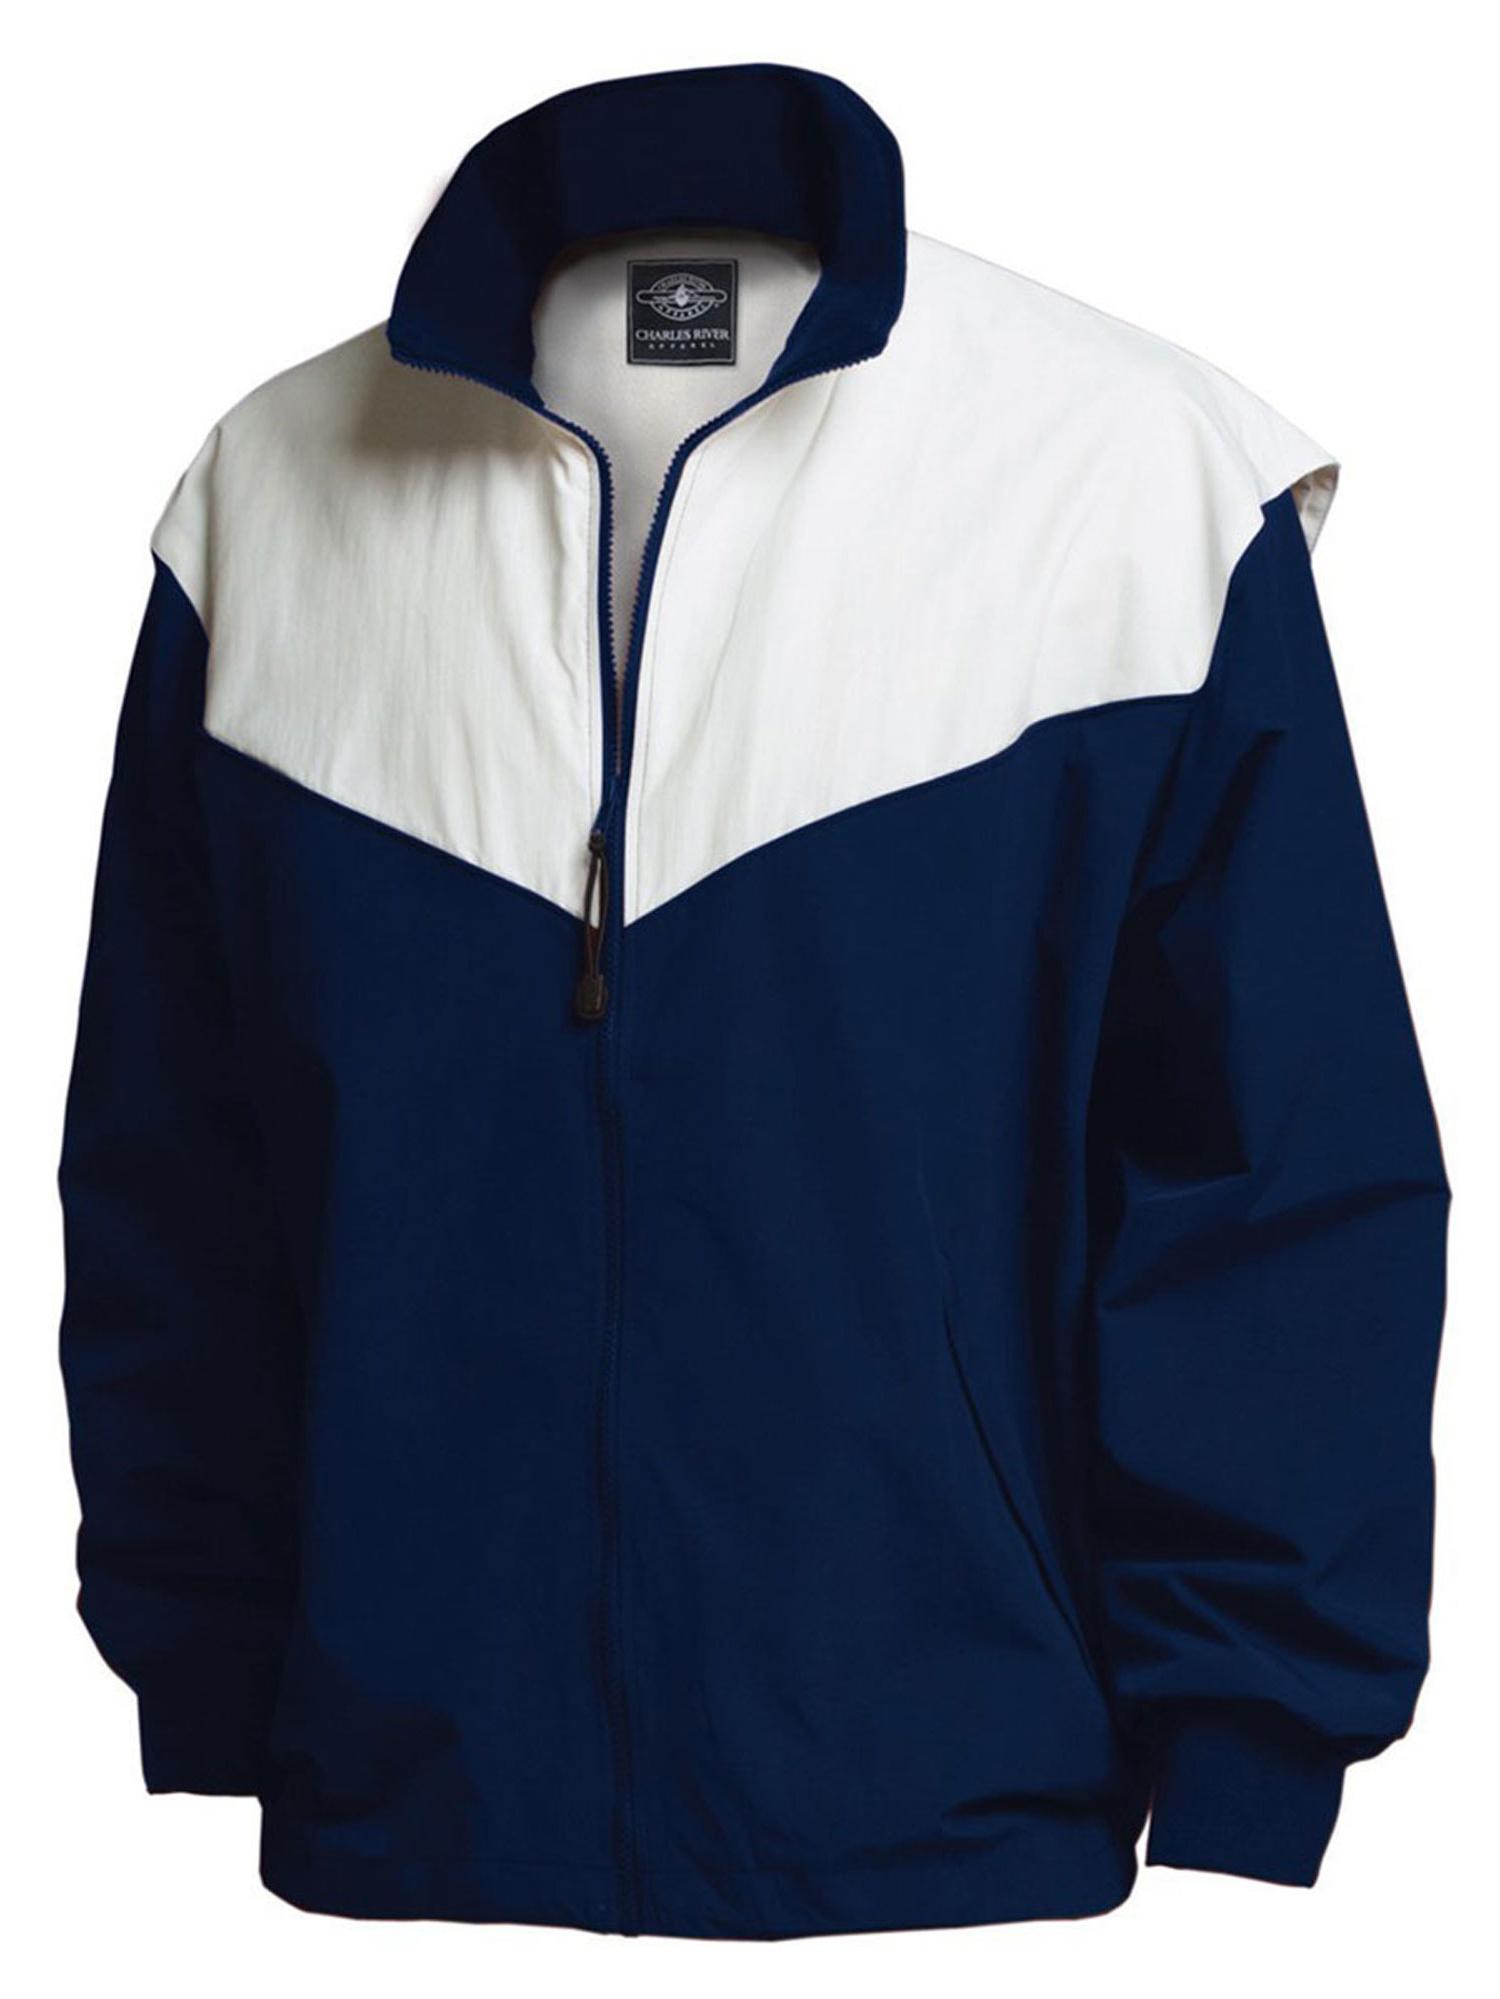 Charles River Apparel Boy's Mesh Lining Champion Jacket